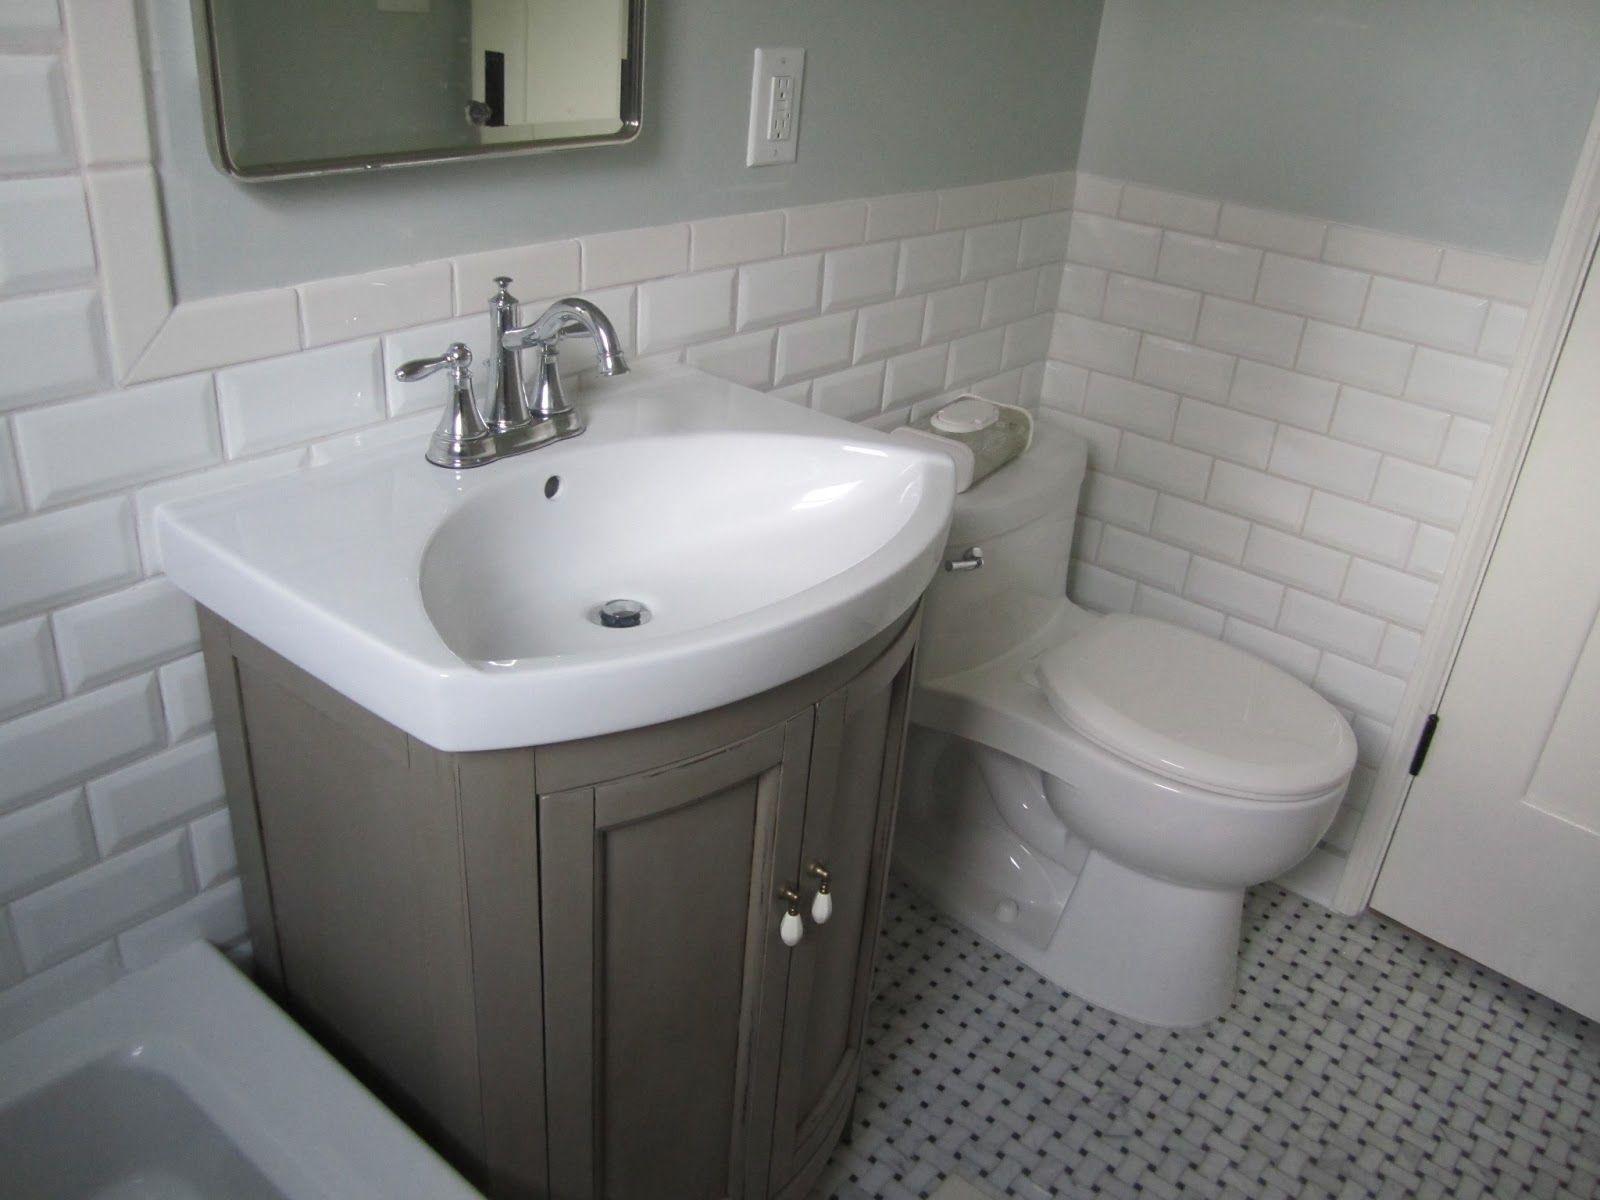 Nice Vanity Beside Bathtub On Small Floortile Bit Brick Wall For Half Bathroom Ideas Jpg 1600 1200 Tile Bathroom Subway Tiles Bathroom Grey Bathroom Tiles